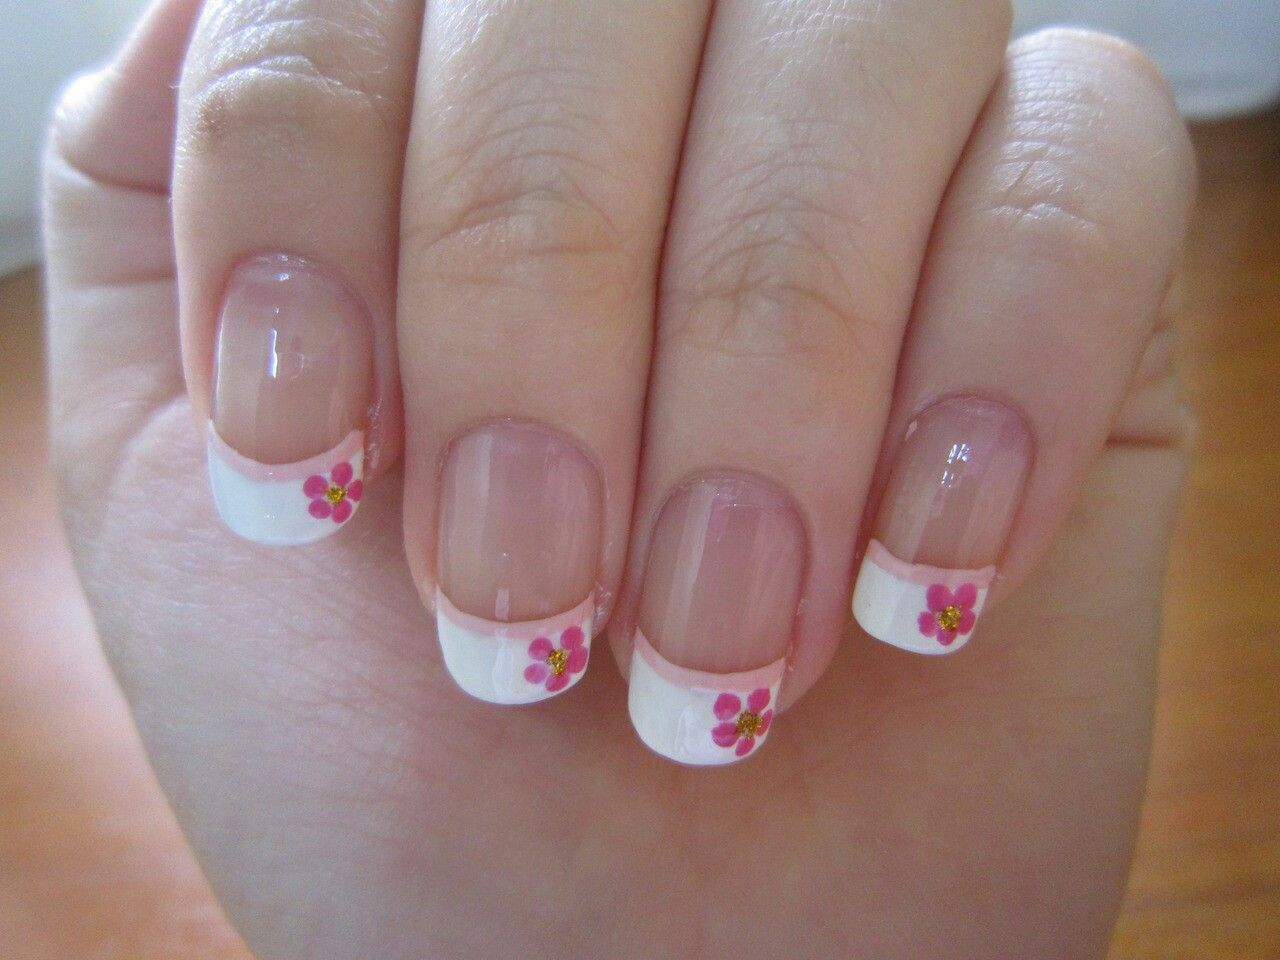 Pin by Gerencsér Anita on Nails   Pinterest